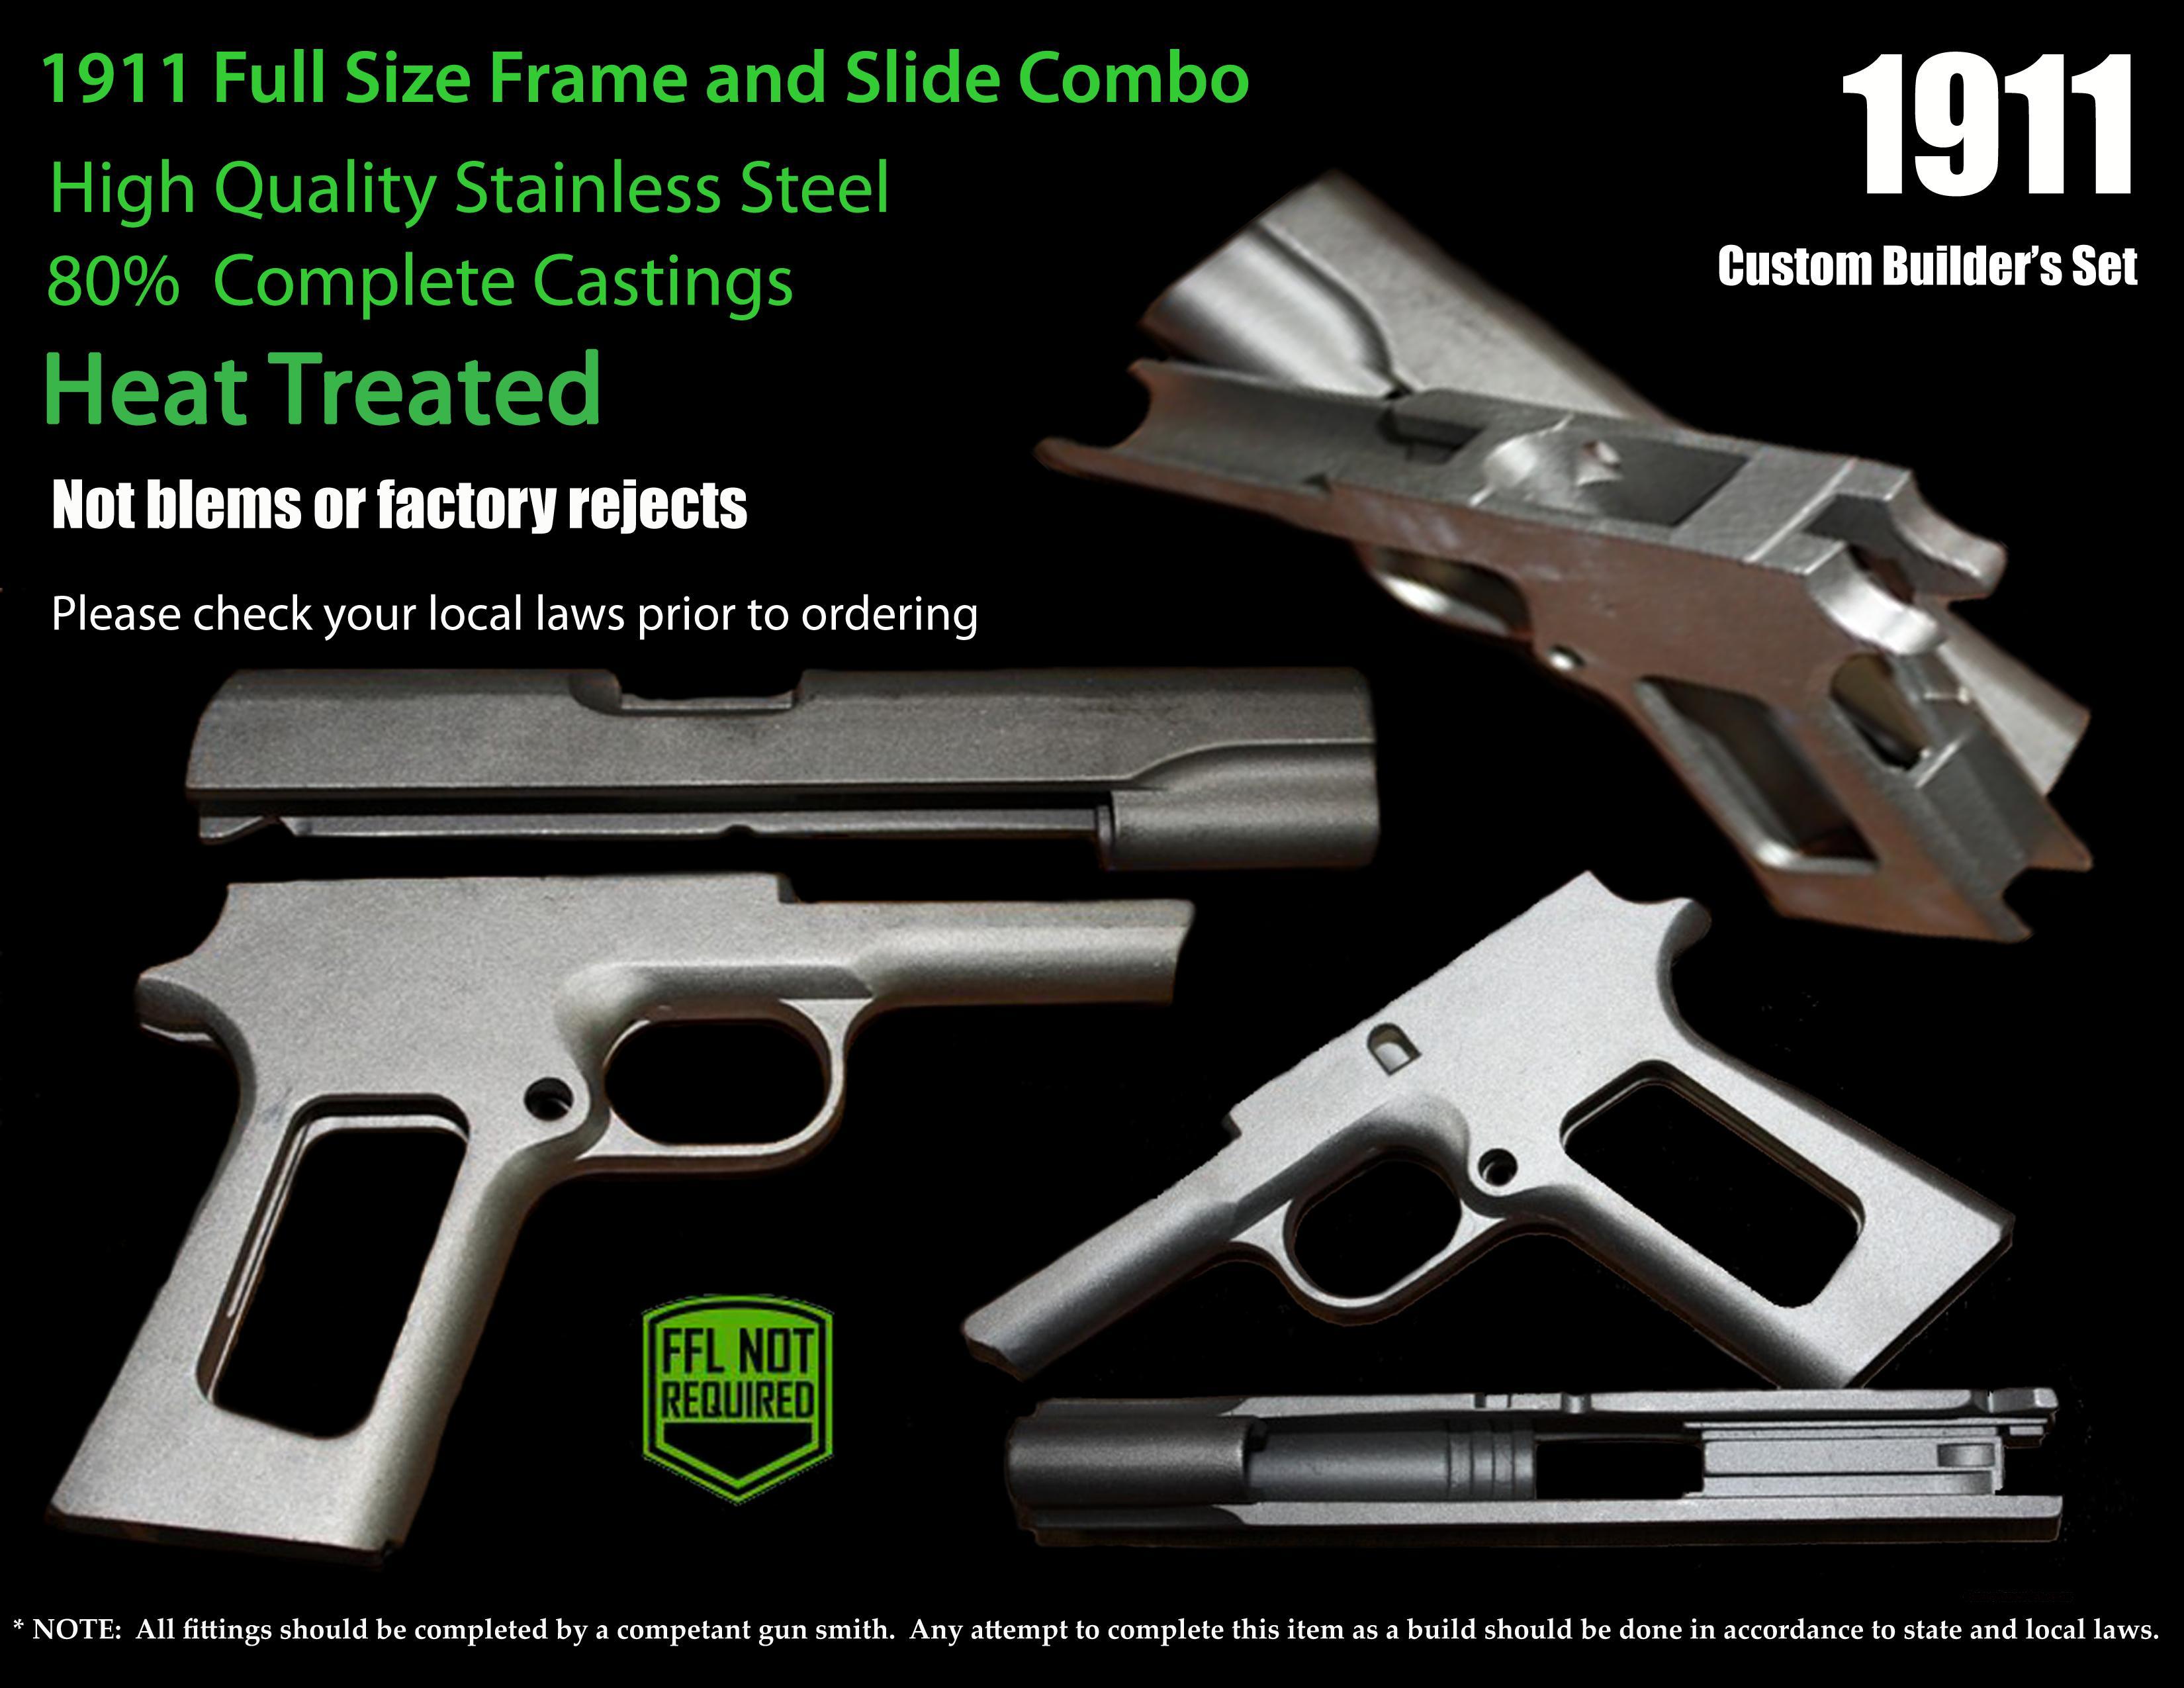 1911 80% Casting combo Frame & Slide for sale